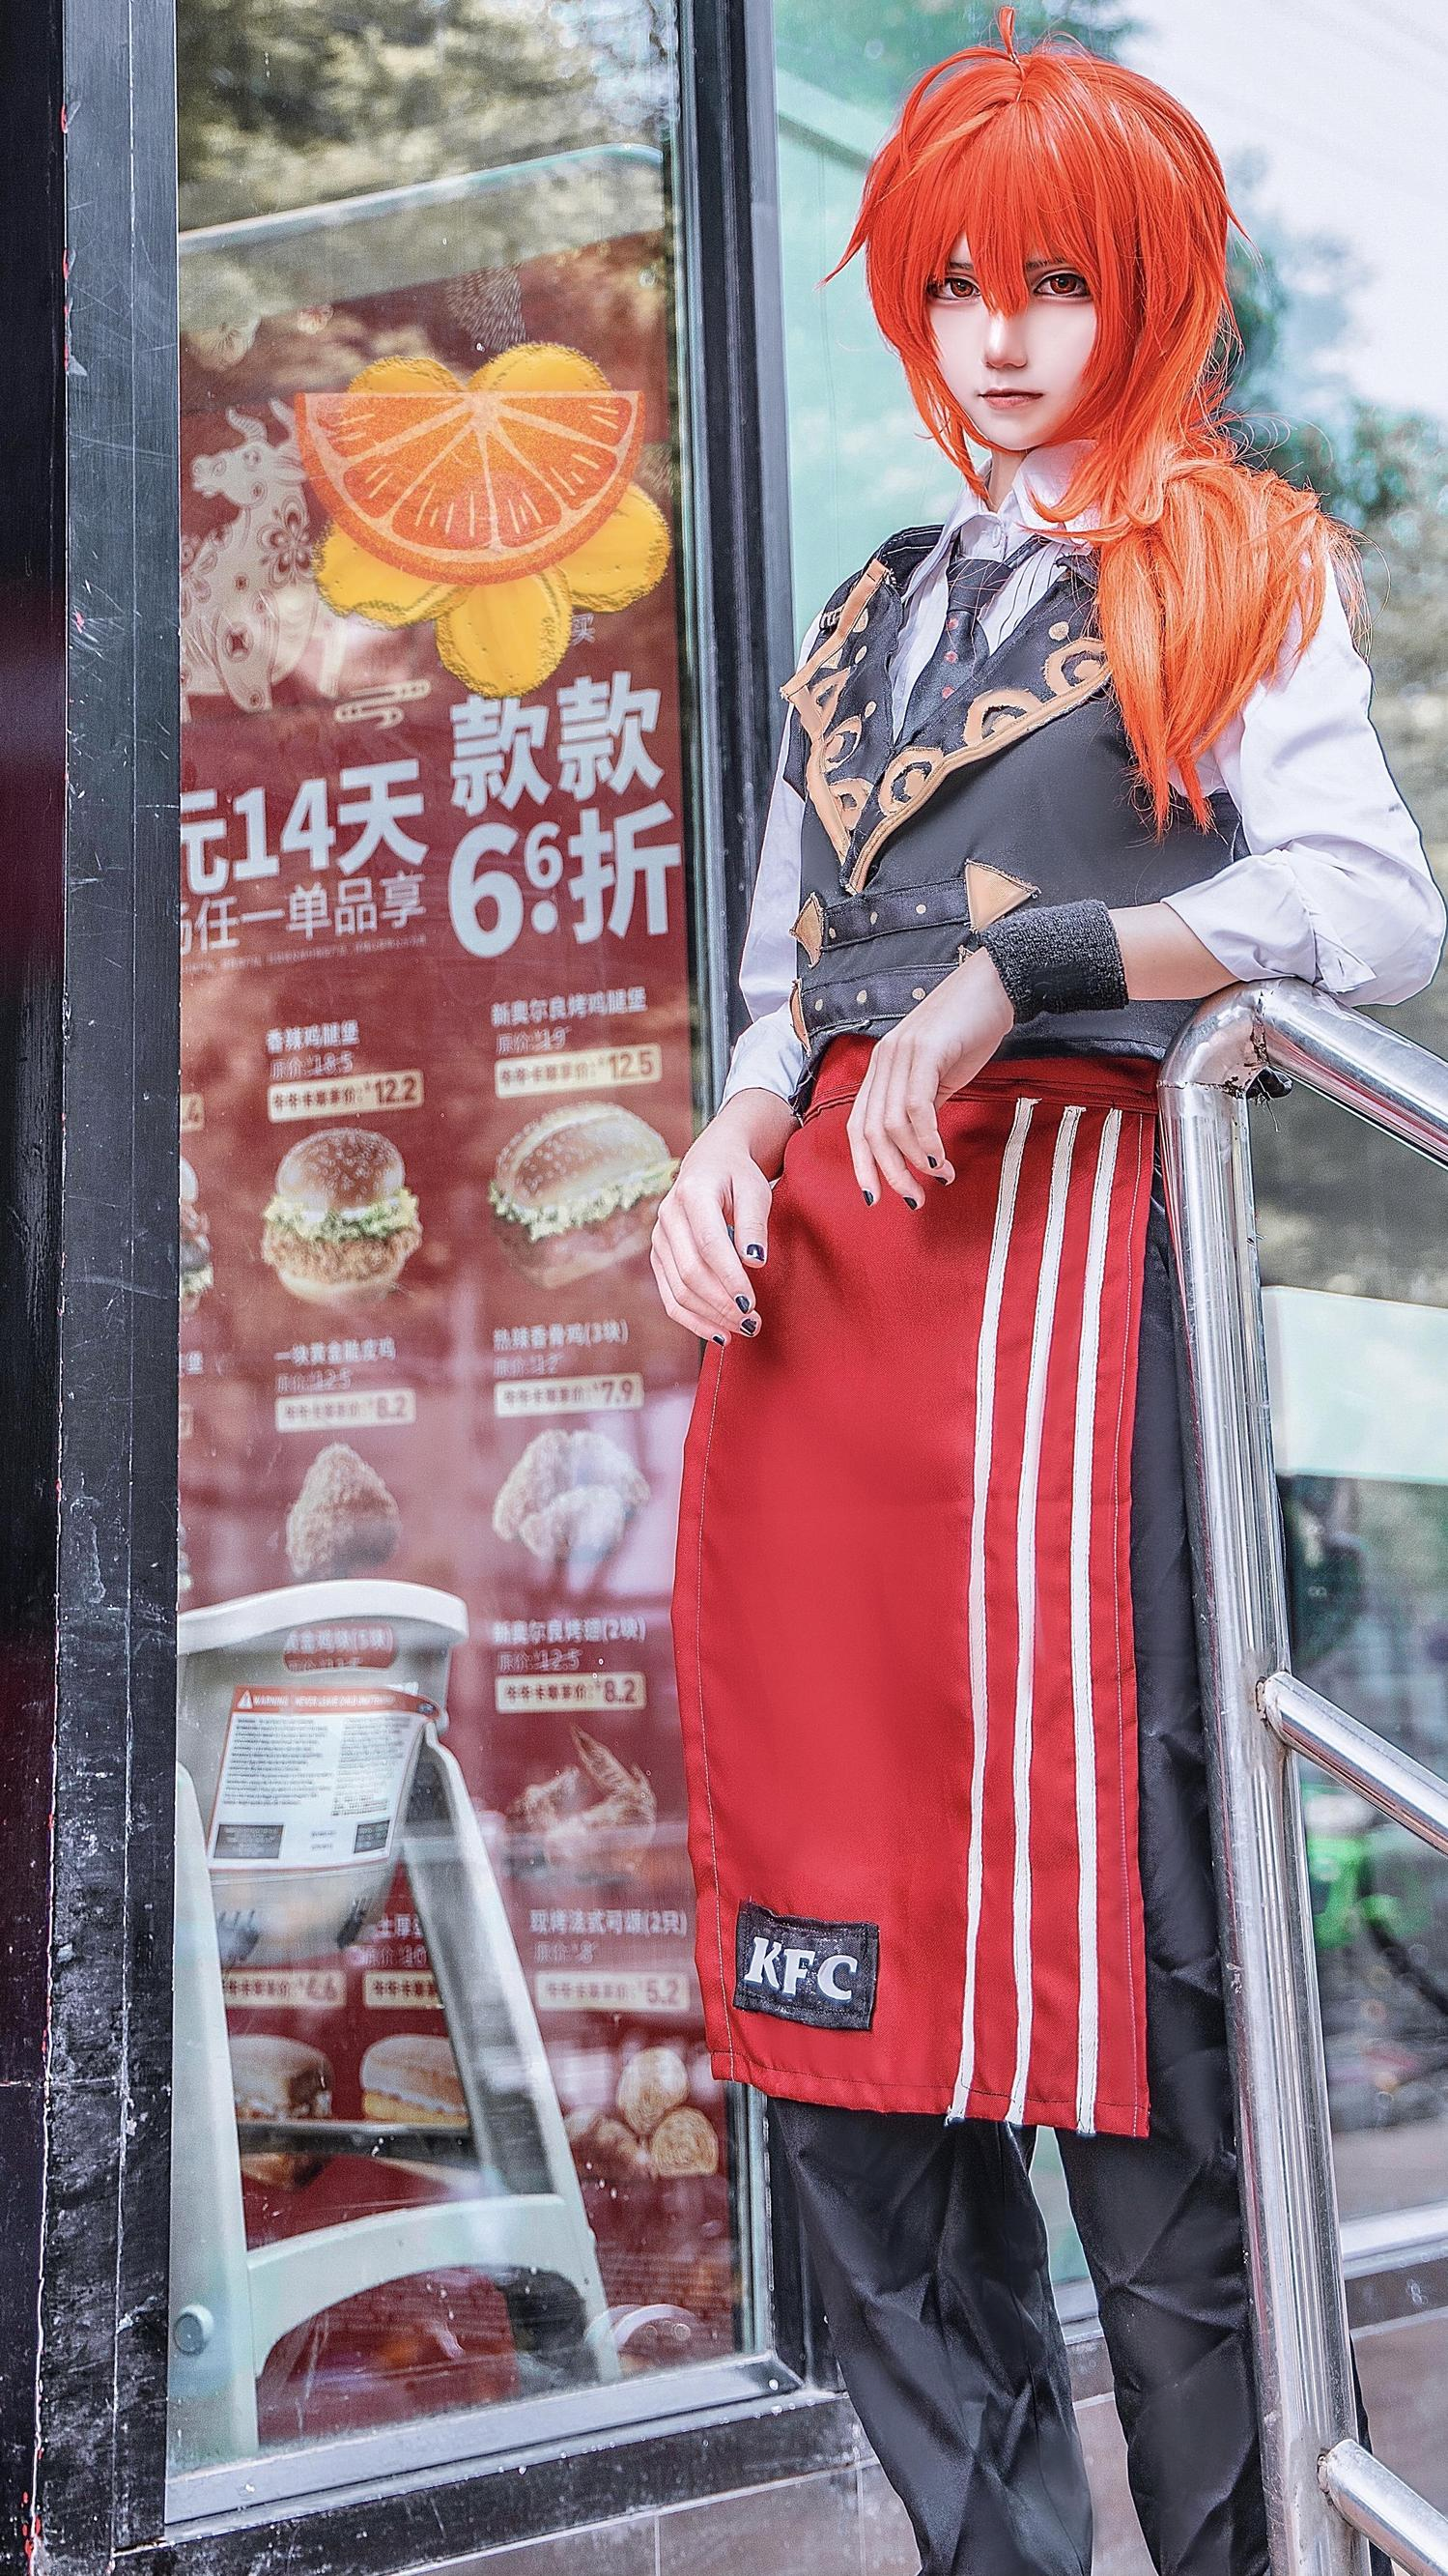 《原神》卢克cosplay【CN:南千鲤Akirui】-第6张